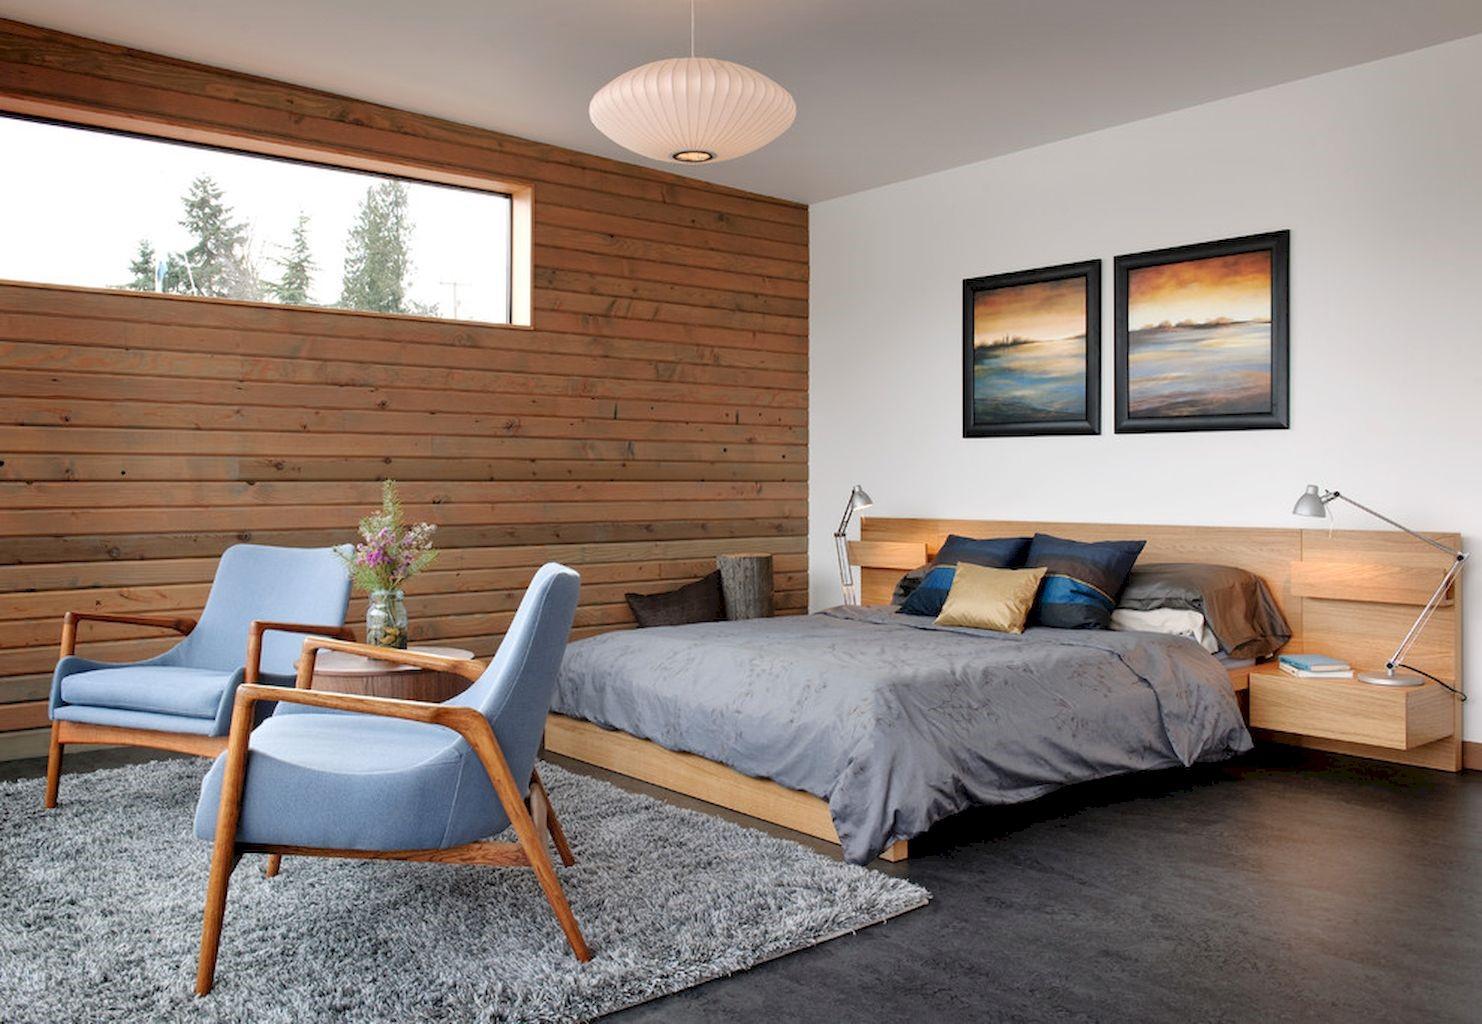 Modern Midcentury Bedroom Ideas and Inspiration 1 - دکوراسیون داخلی به سبک مدرن میدسنچری (میانه قرن بیستم)